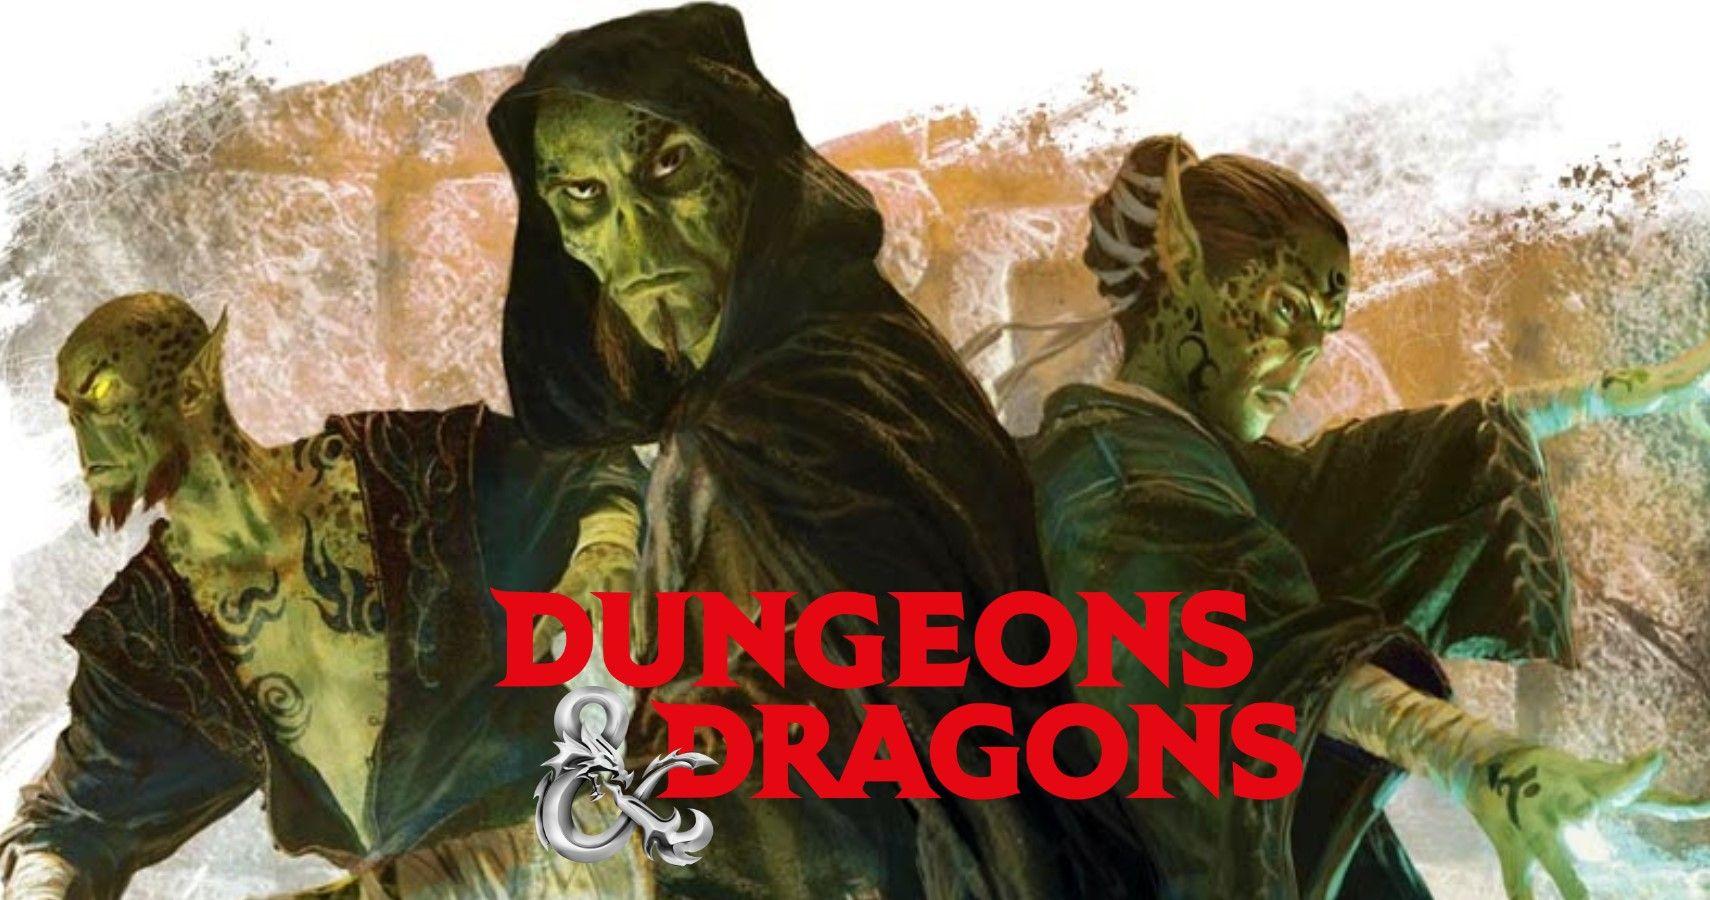 Dungeons & Dragons: todas las subclase de monjes oficiales, clasificadas